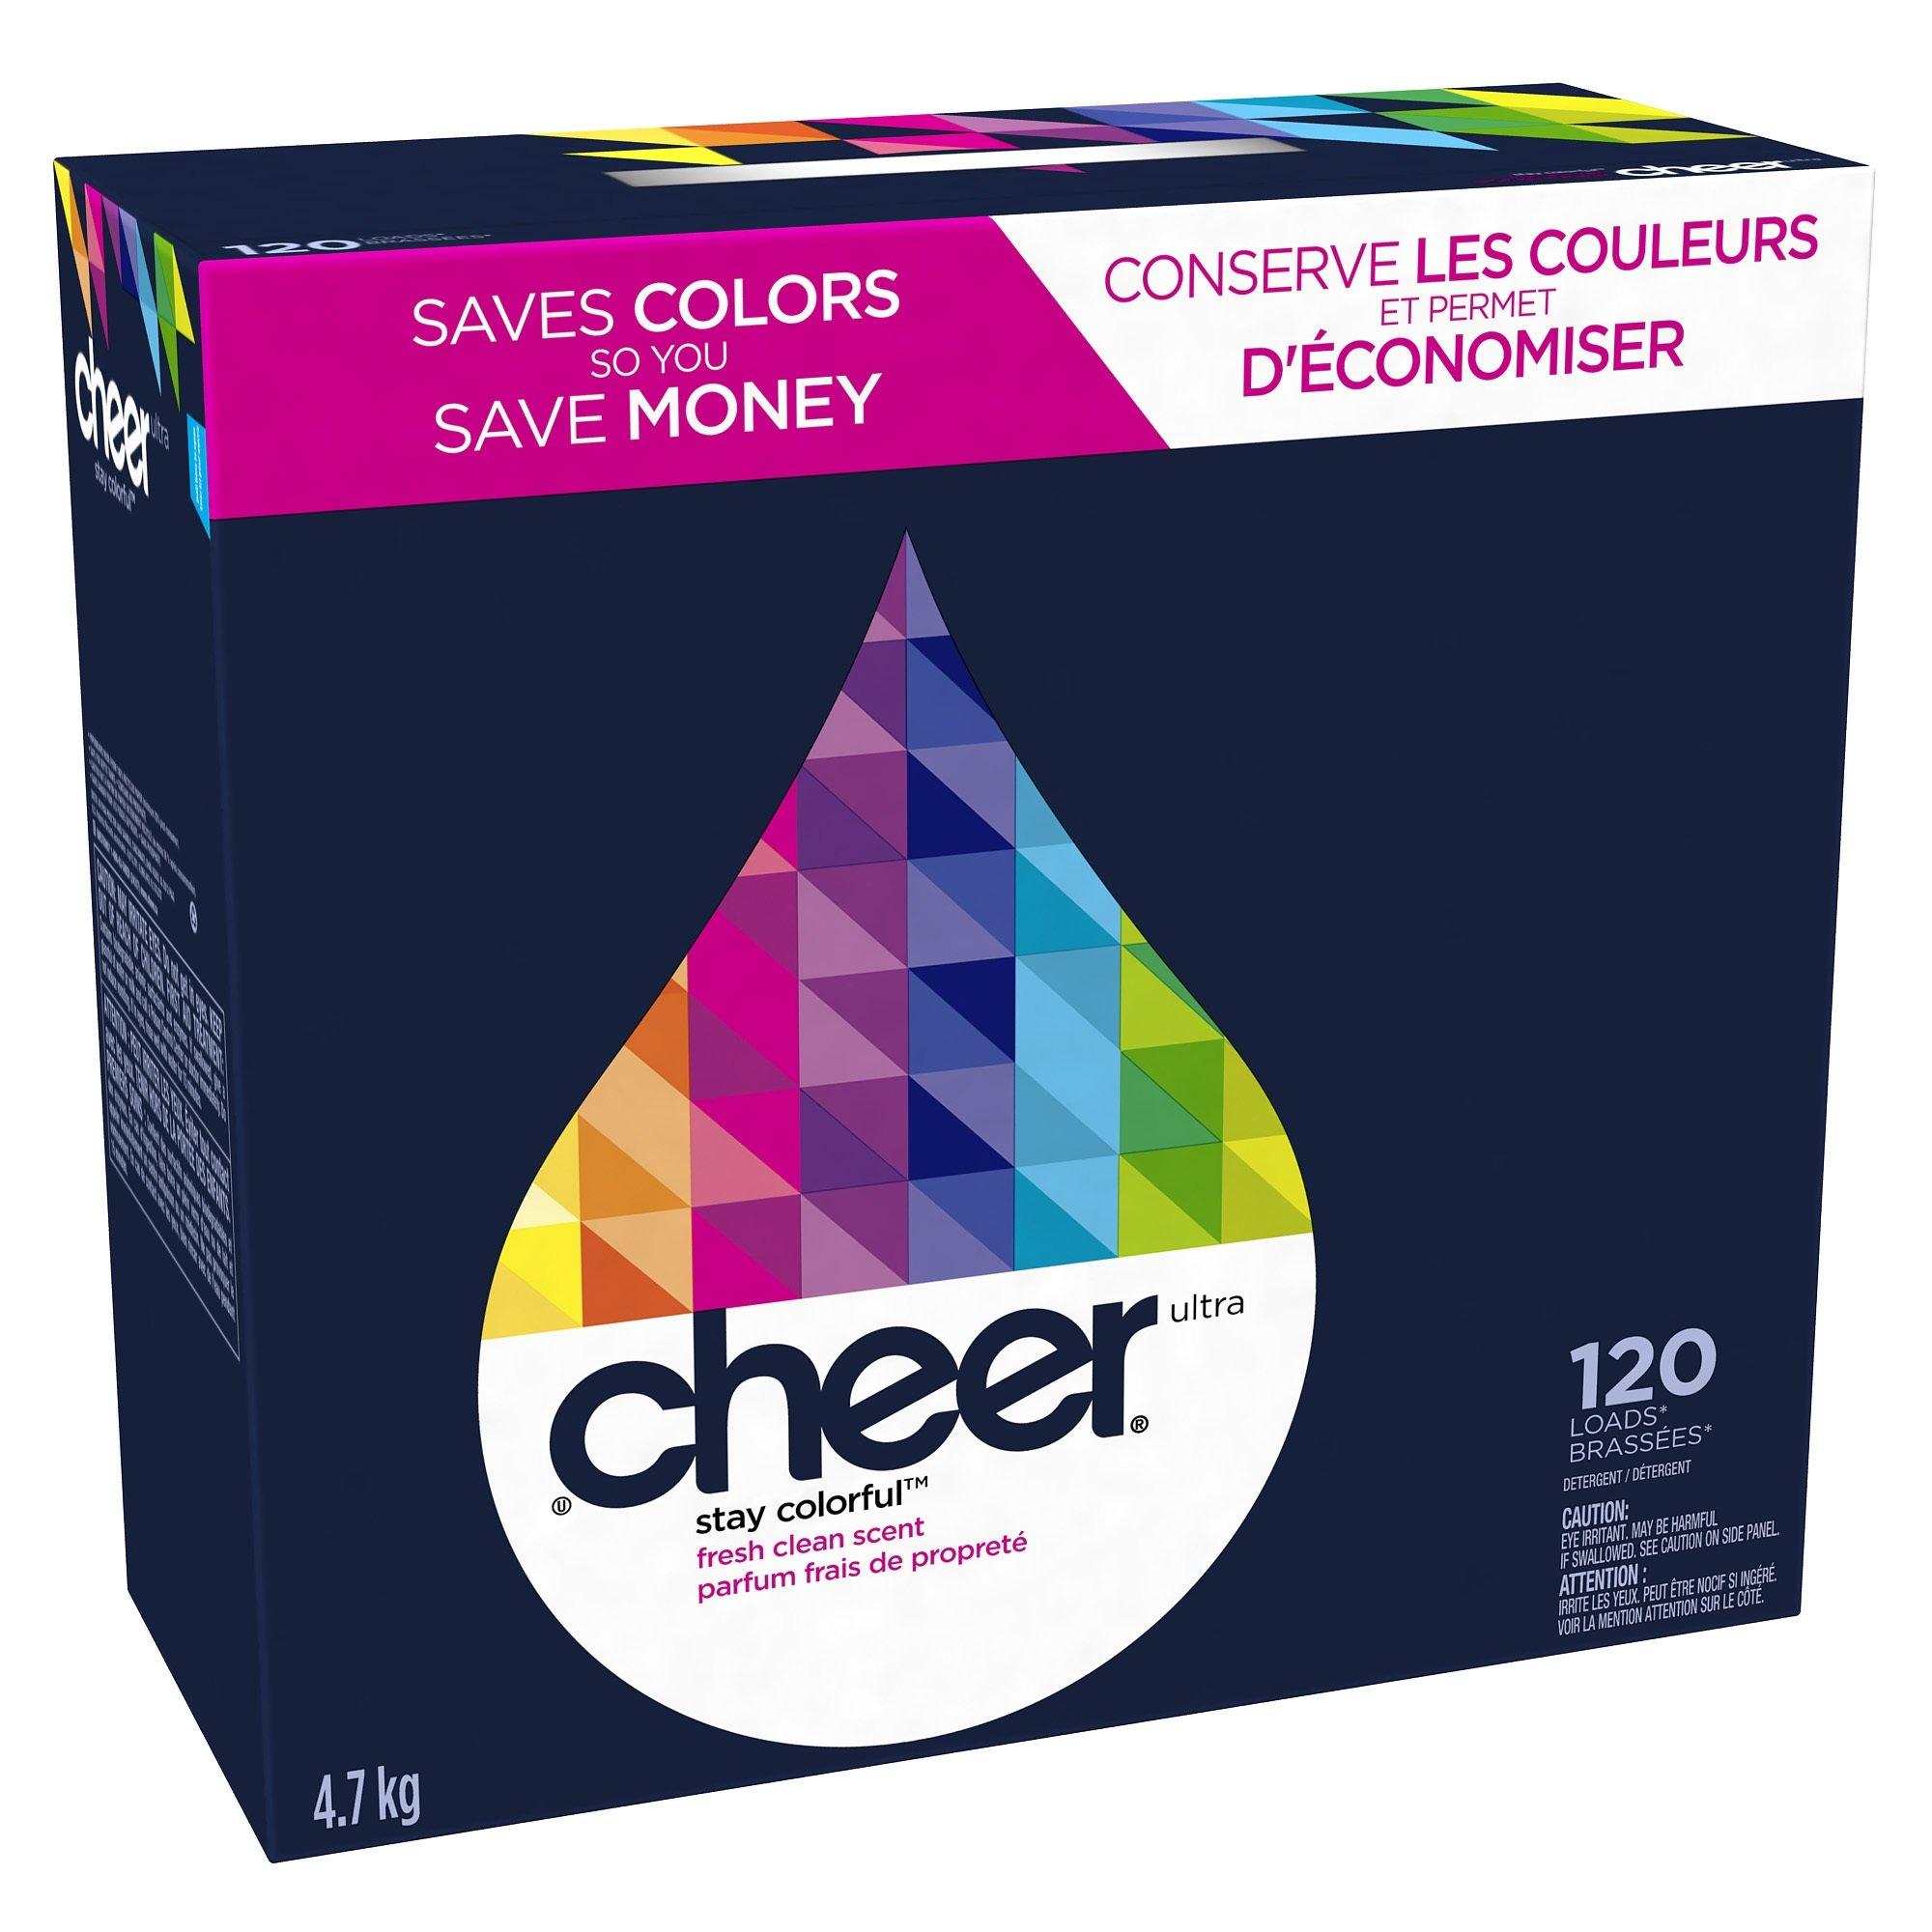 Cheer, Fresh Clean Scent Detergent Powder 120 Loads, 169 Ounce